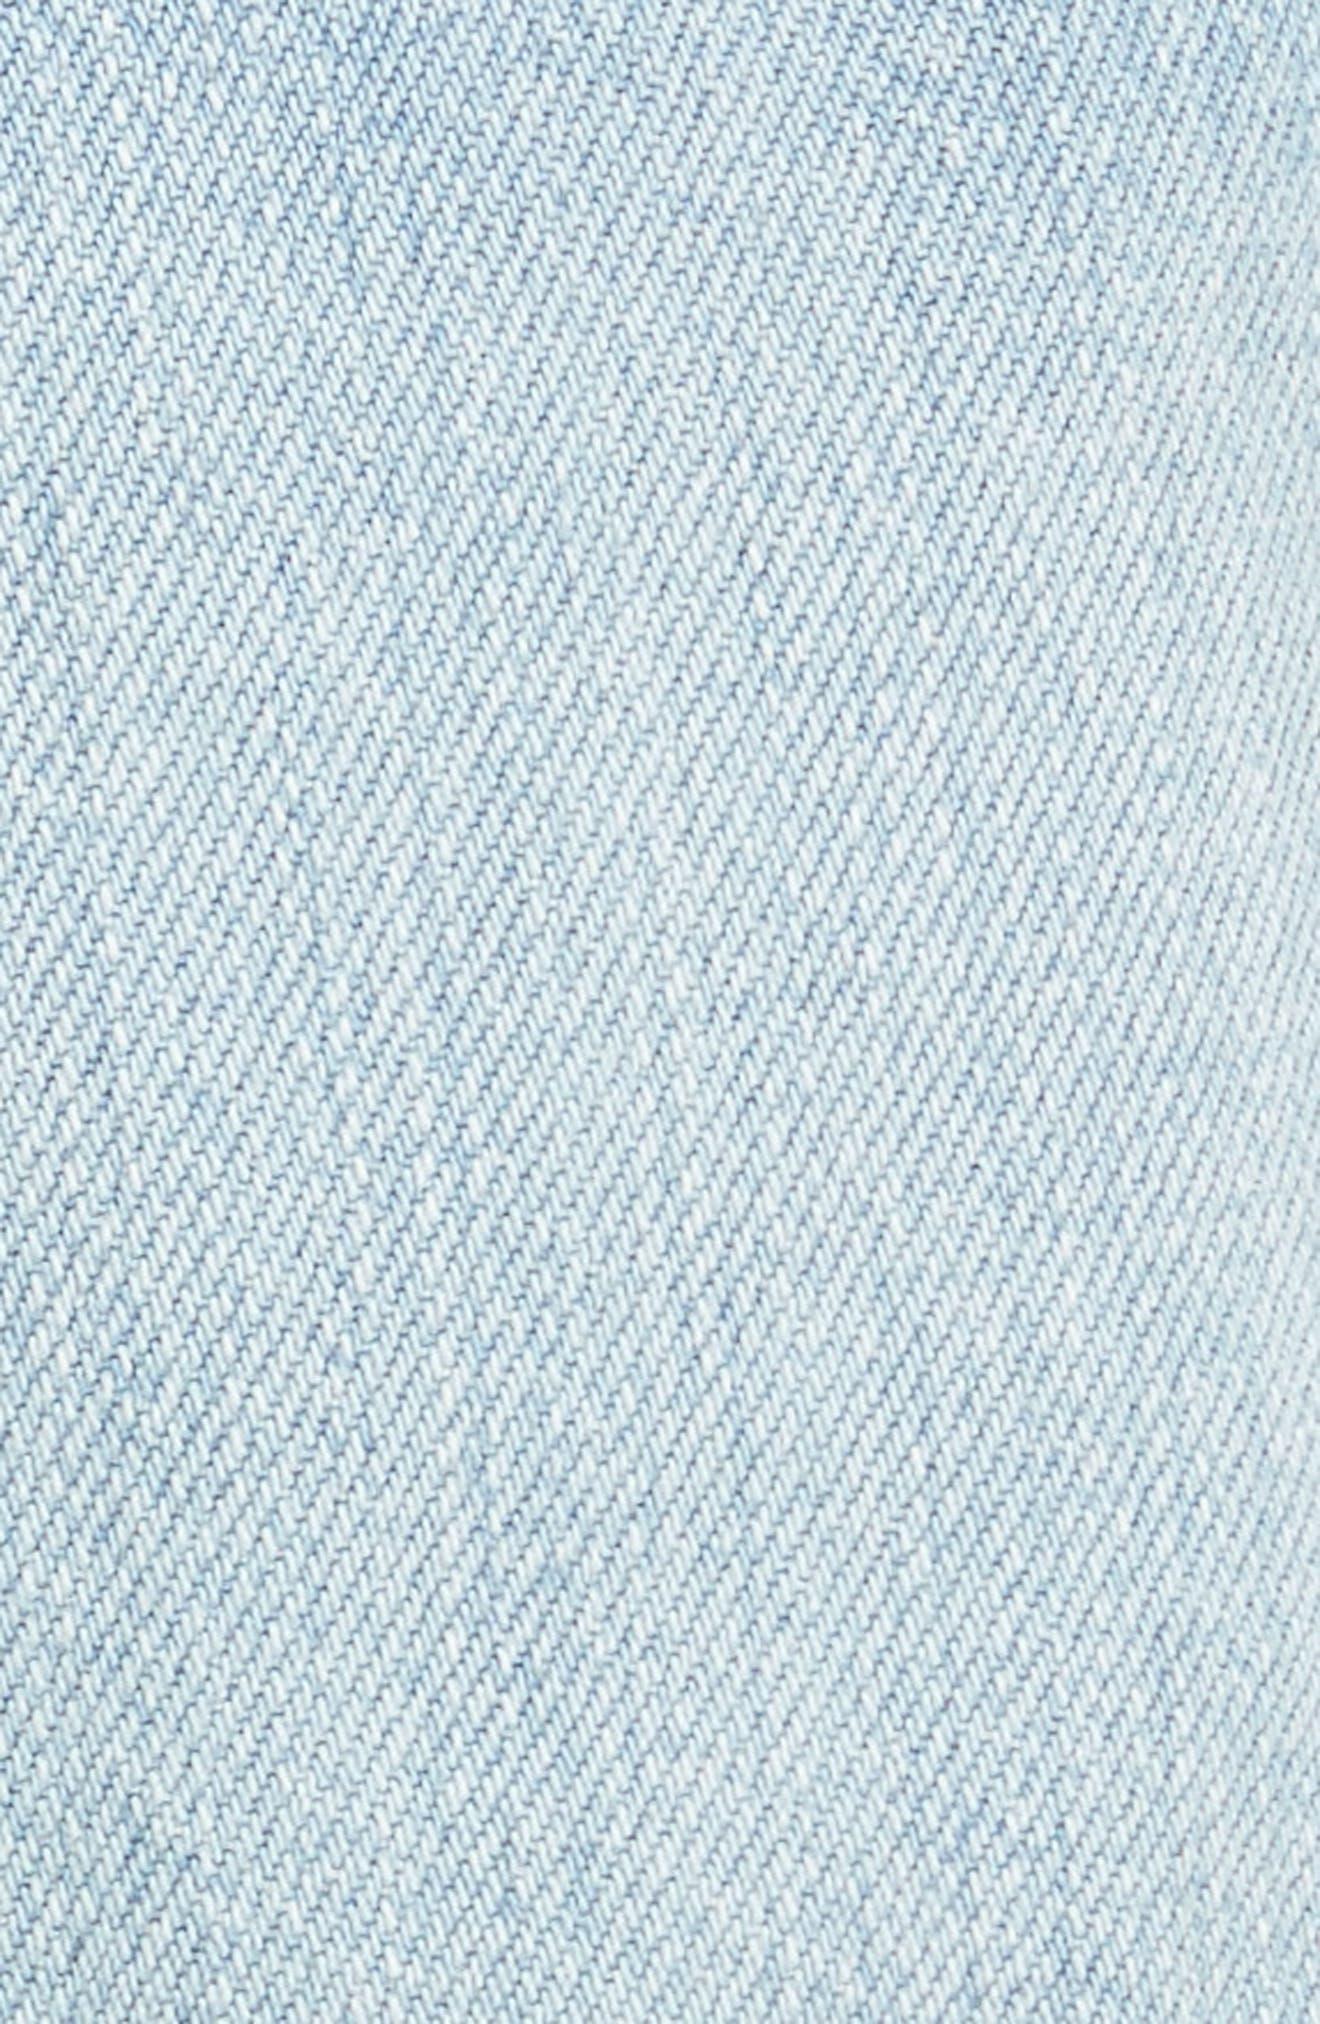 Cutoff Denim Shorts,                             Alternate thumbnail 6, color,                             Gregory Way